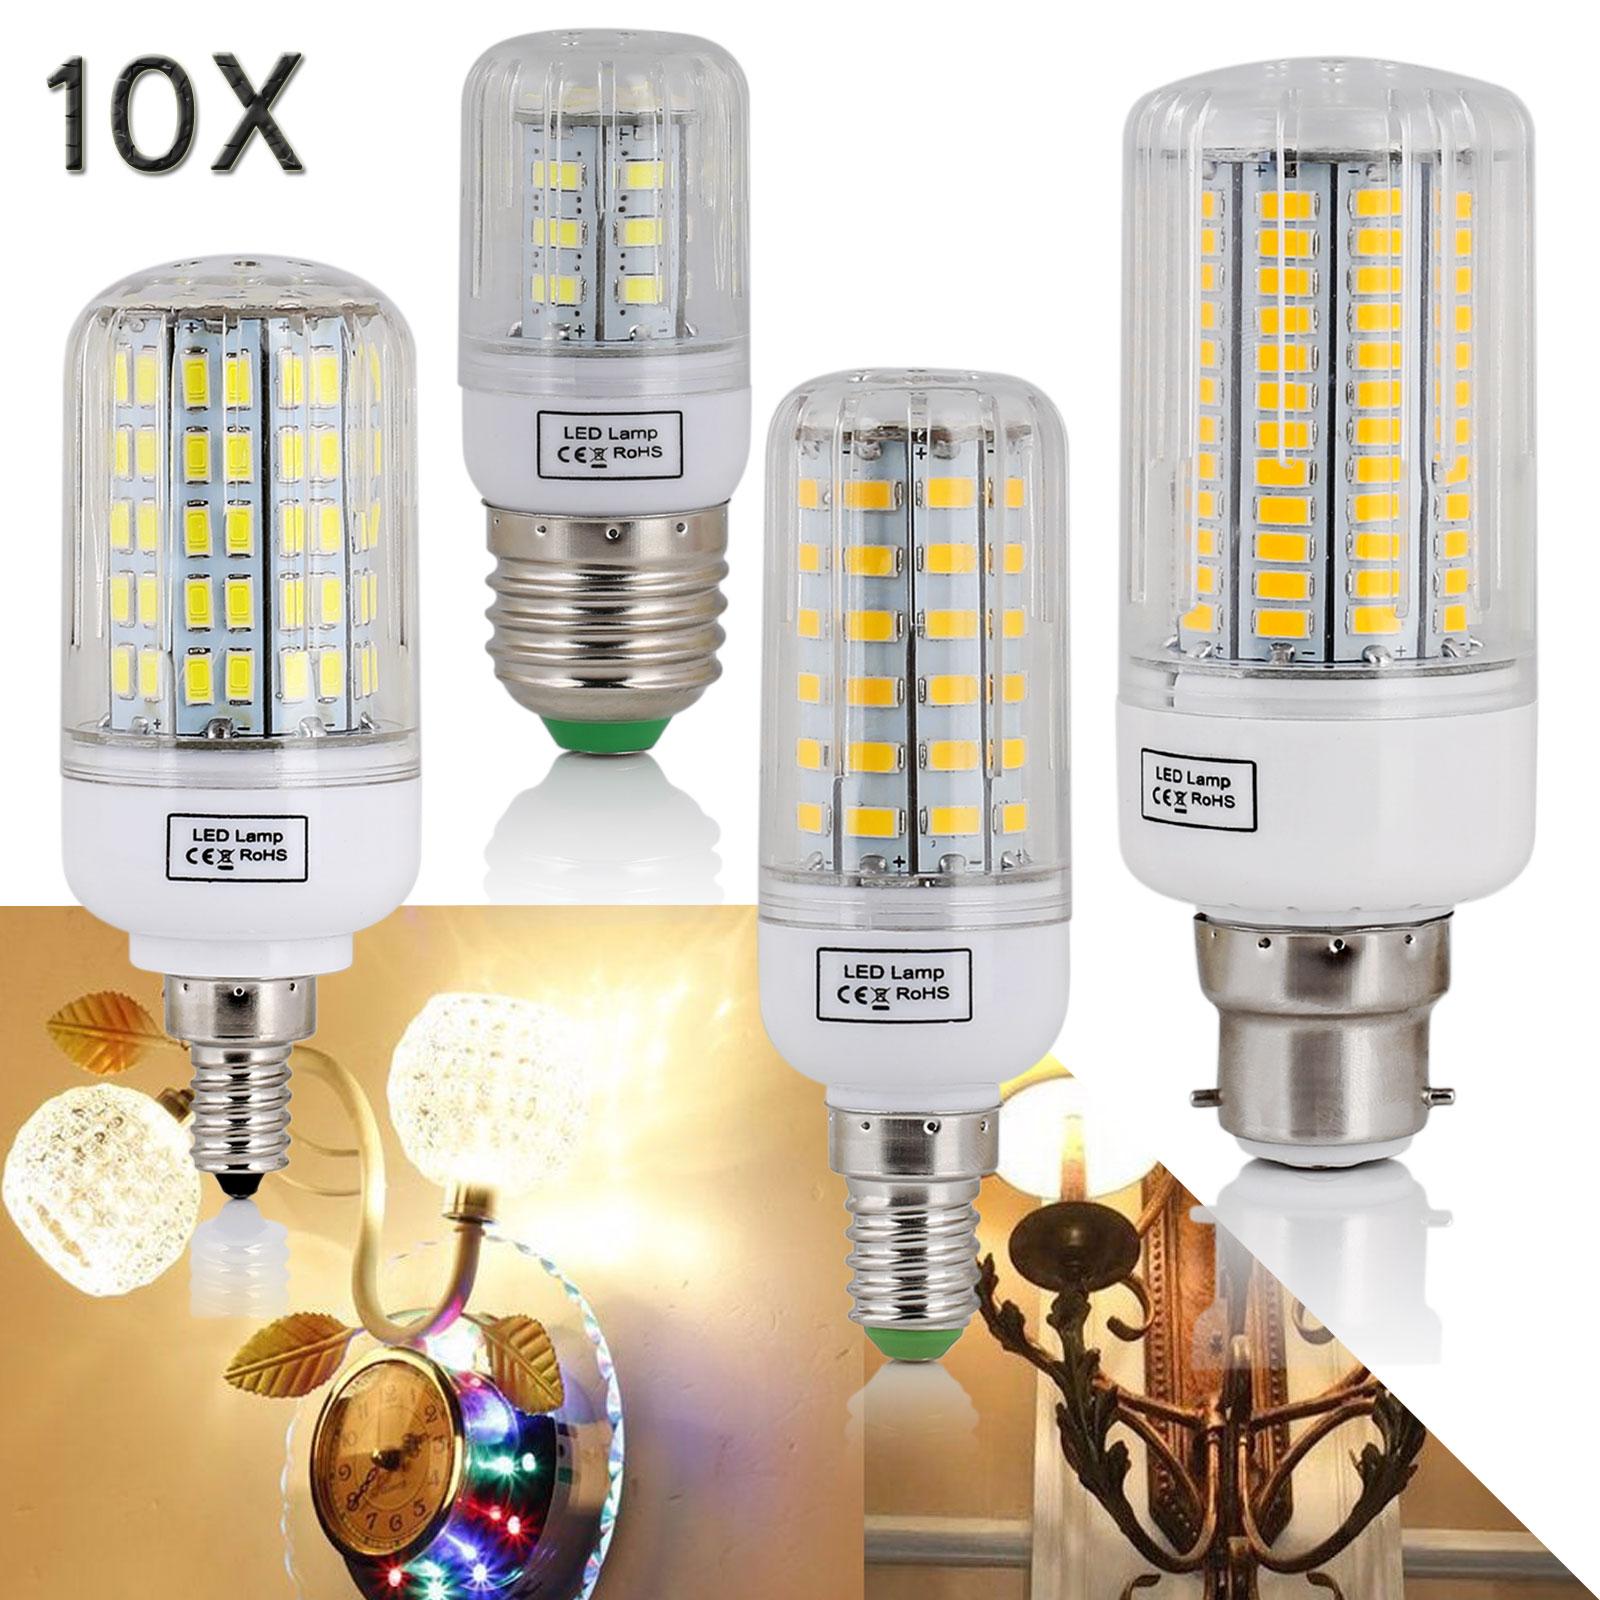 160W E27 E14 E12 B22 LED Corn Bulb 5730 SMD Light Corn Lamp Incandescent 20W